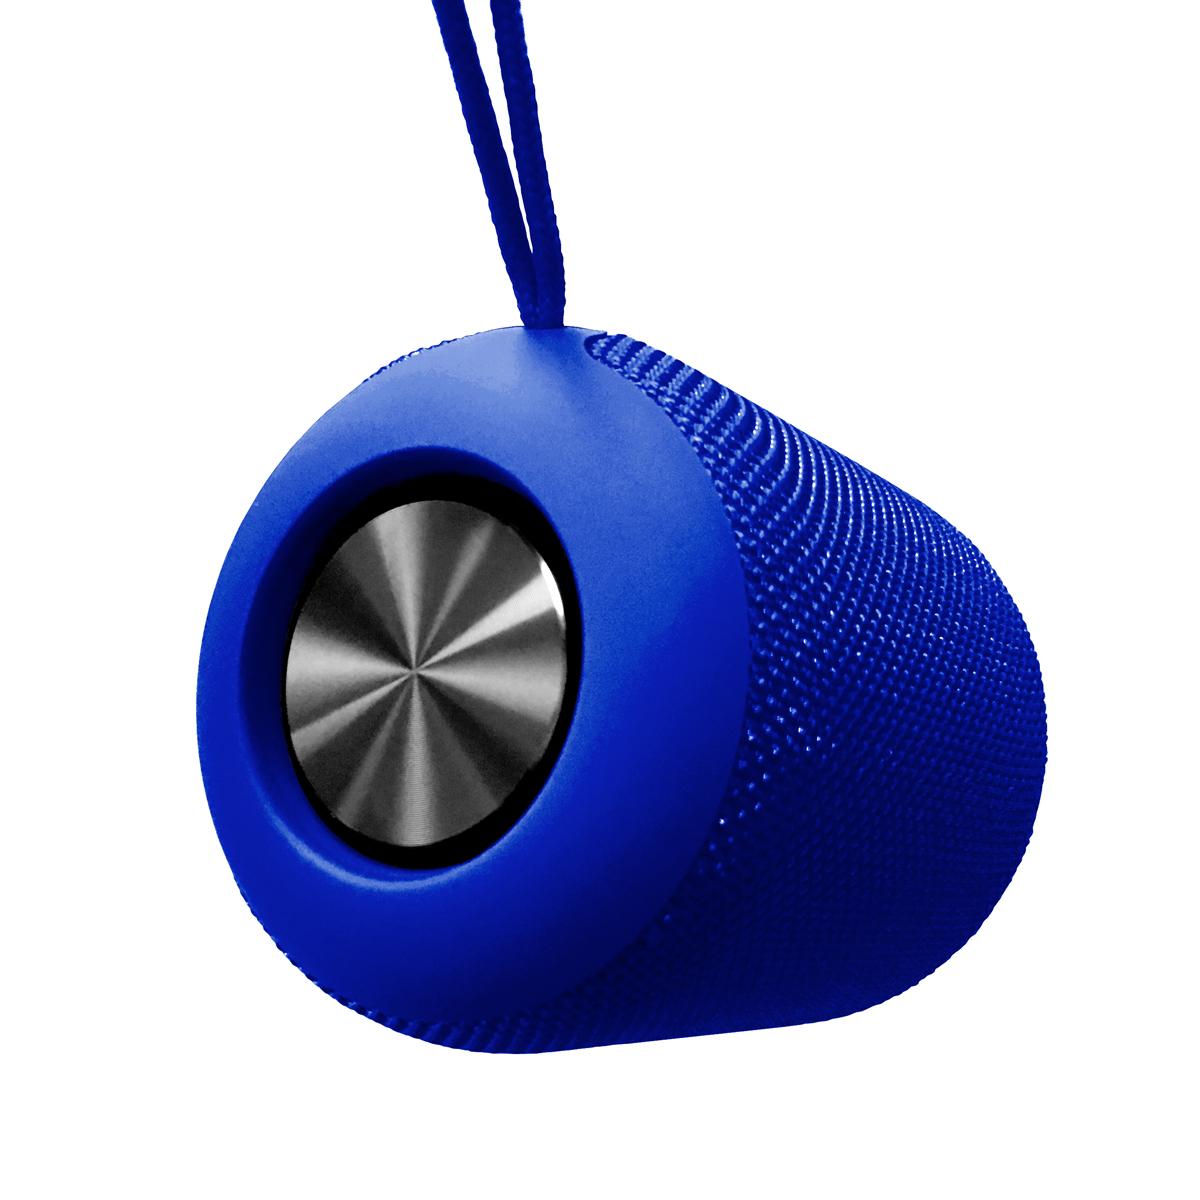 Platinet PEAK Bluetooth speaker, 10Watt (2x5W), BT5 + EDR,, 2200mAh, IPX5 waterproof, cardreader, BLAUW